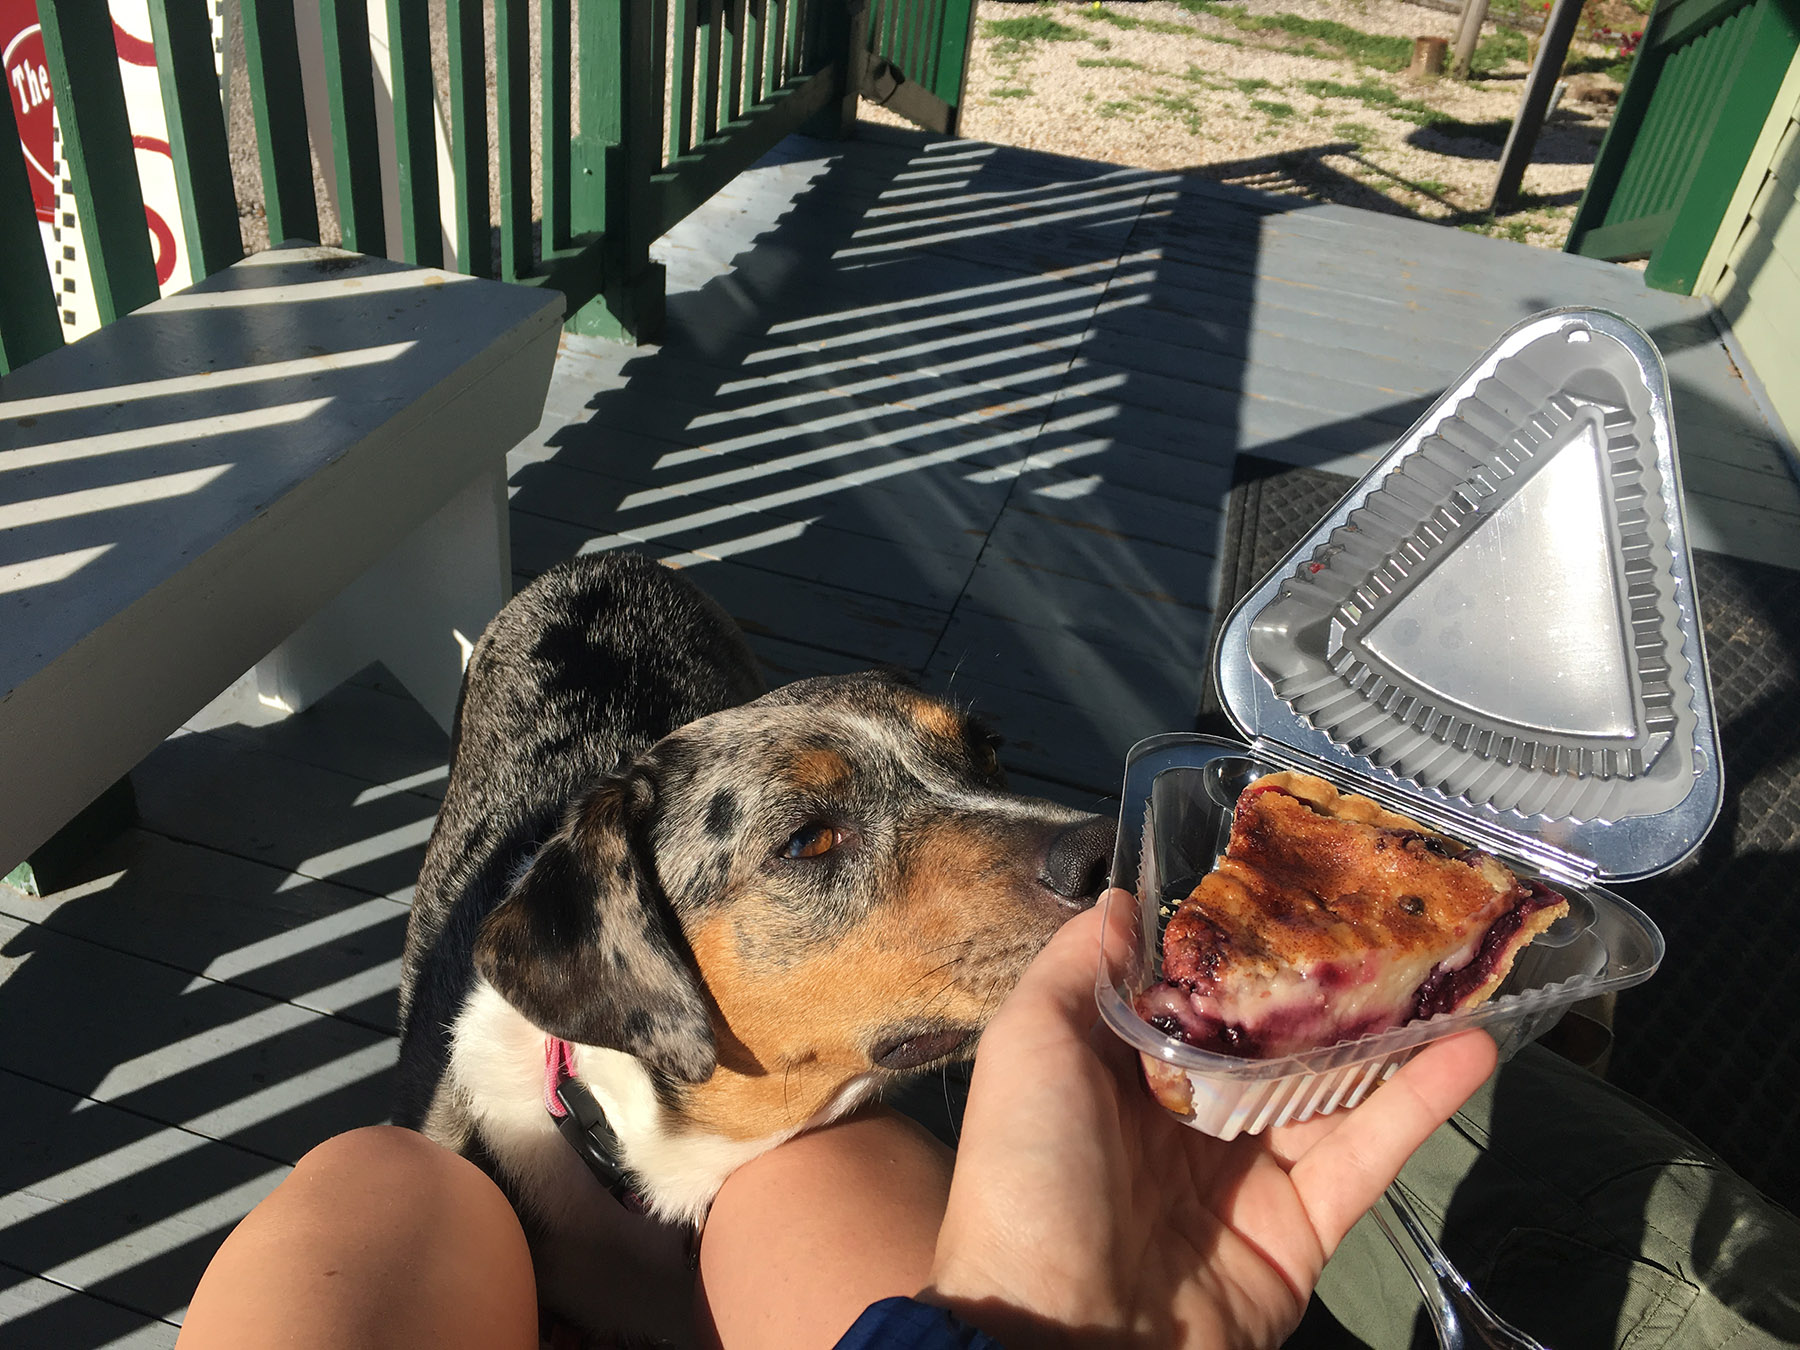 Lily smells pie